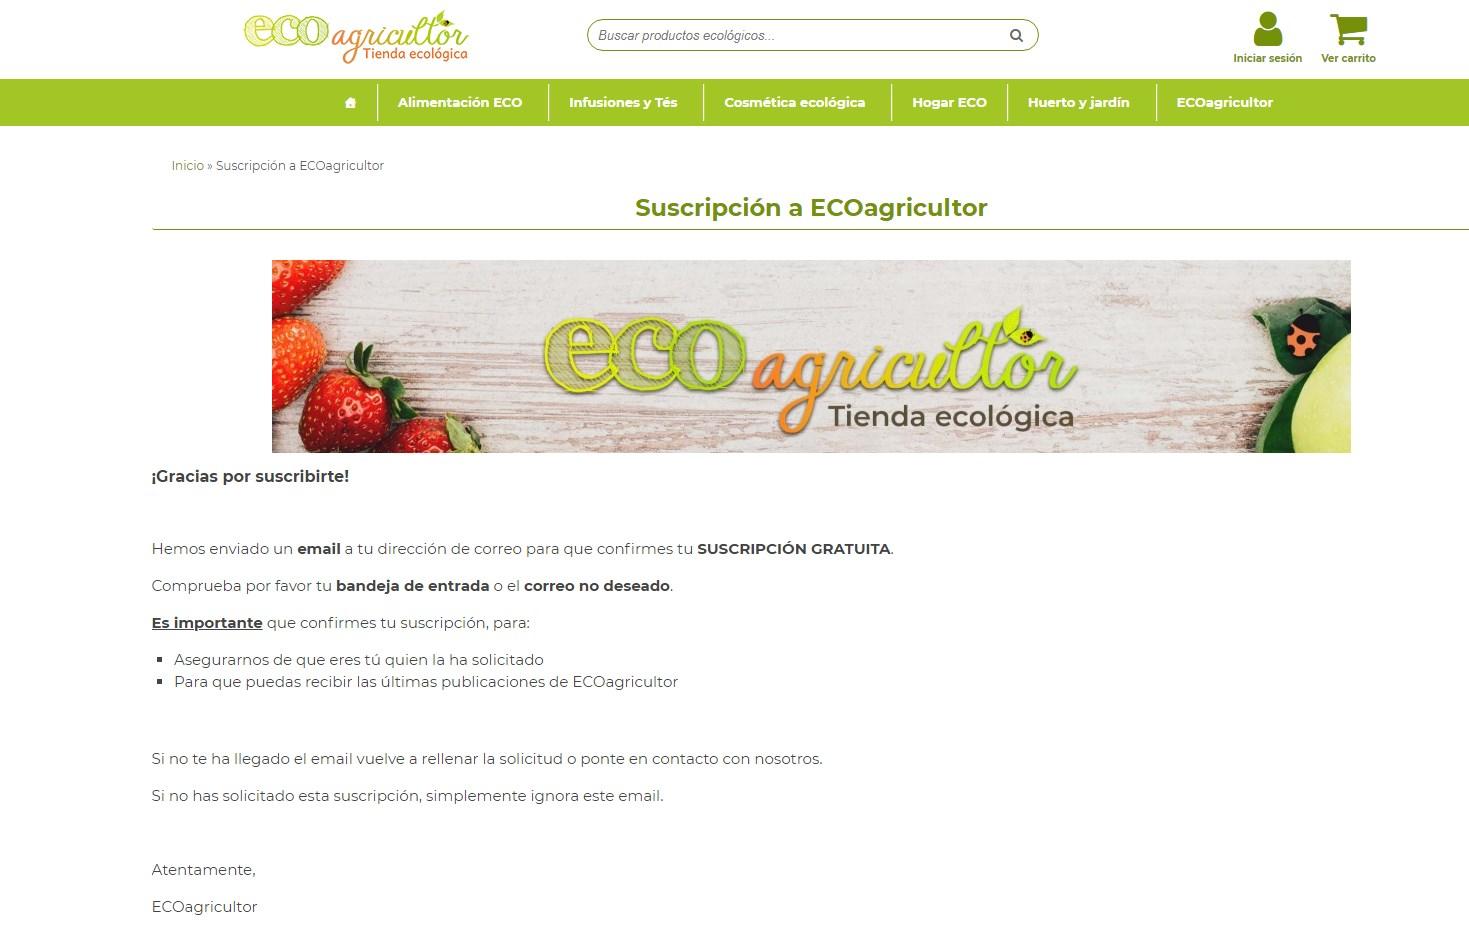 Ecoagricultor